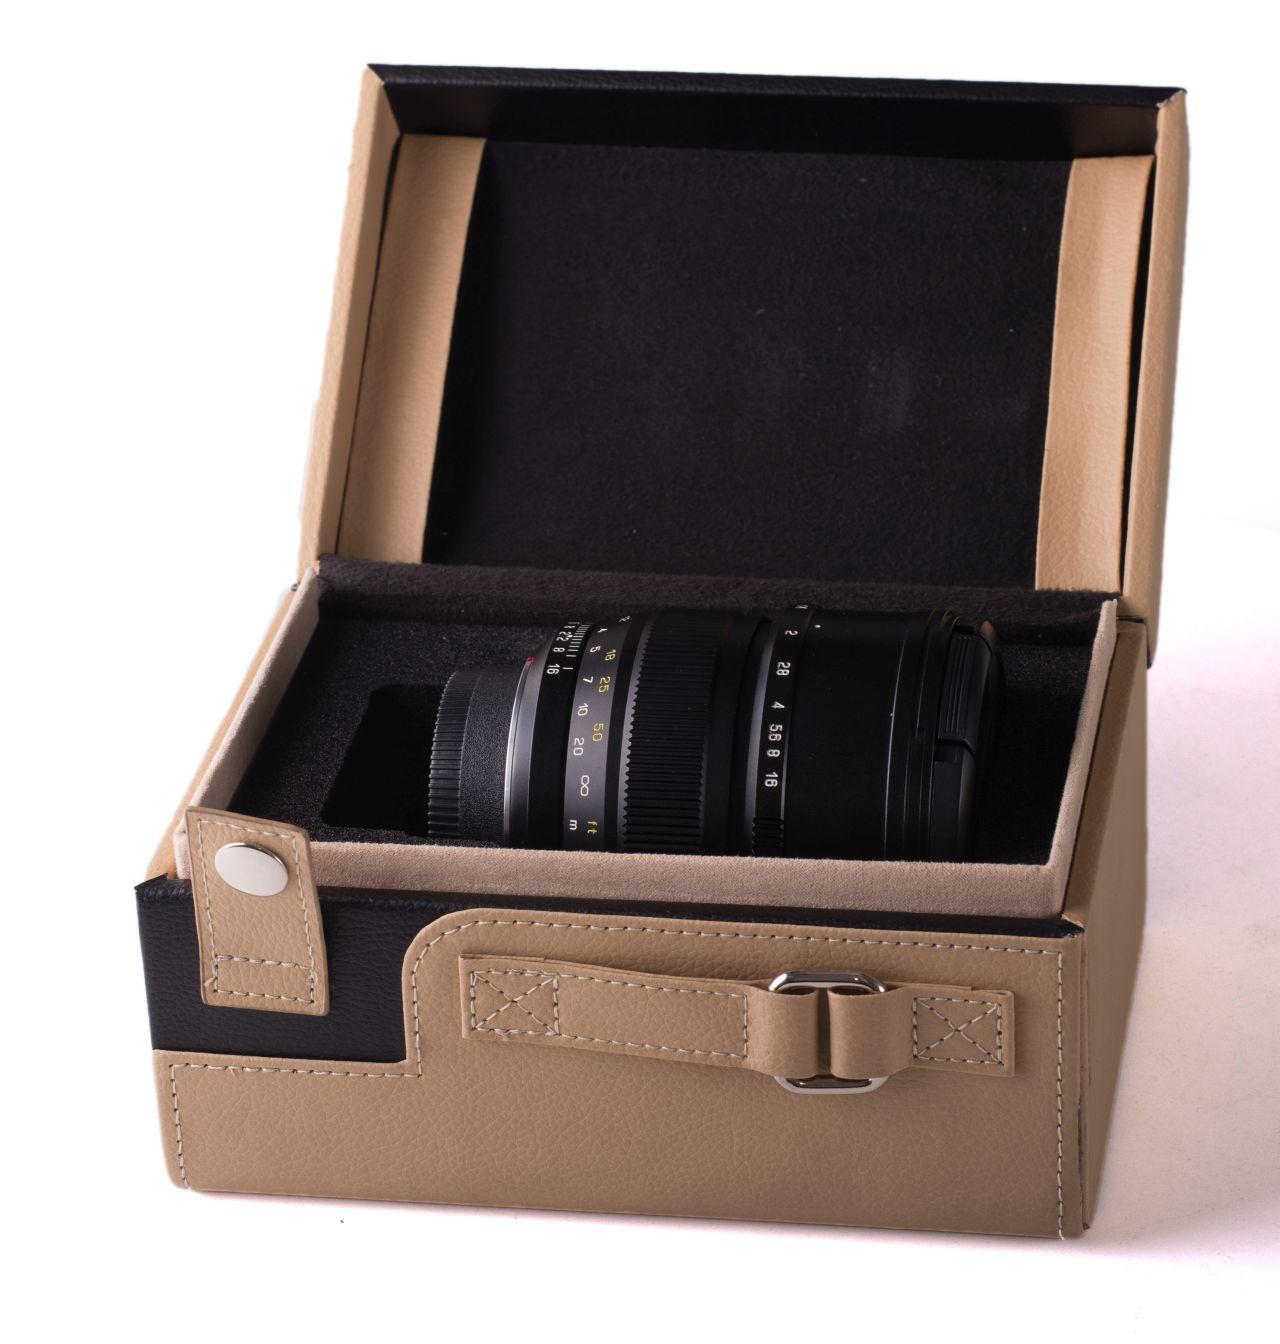 Mitakon Speedmaster 85mm f/1.2